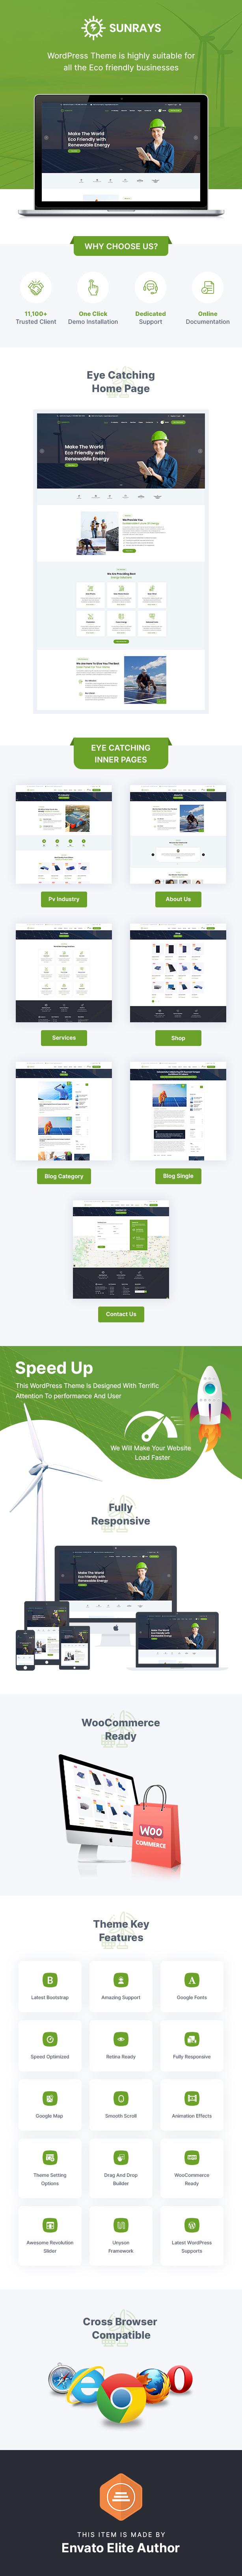 Sunrays – Solar Power & Green Energy WordPress theme - 1